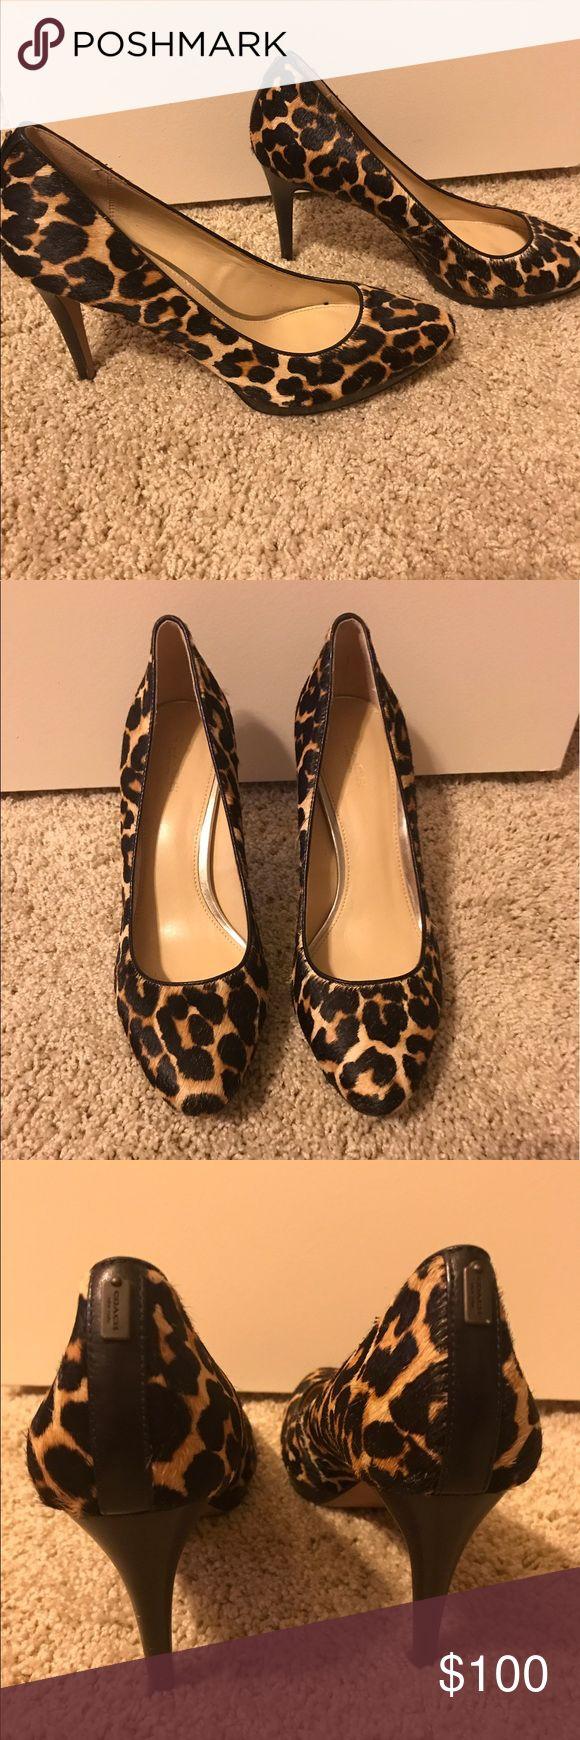 COACH 3 inch cheetah heels COACH cheetah heels. So fun! Coach Shoes Heels